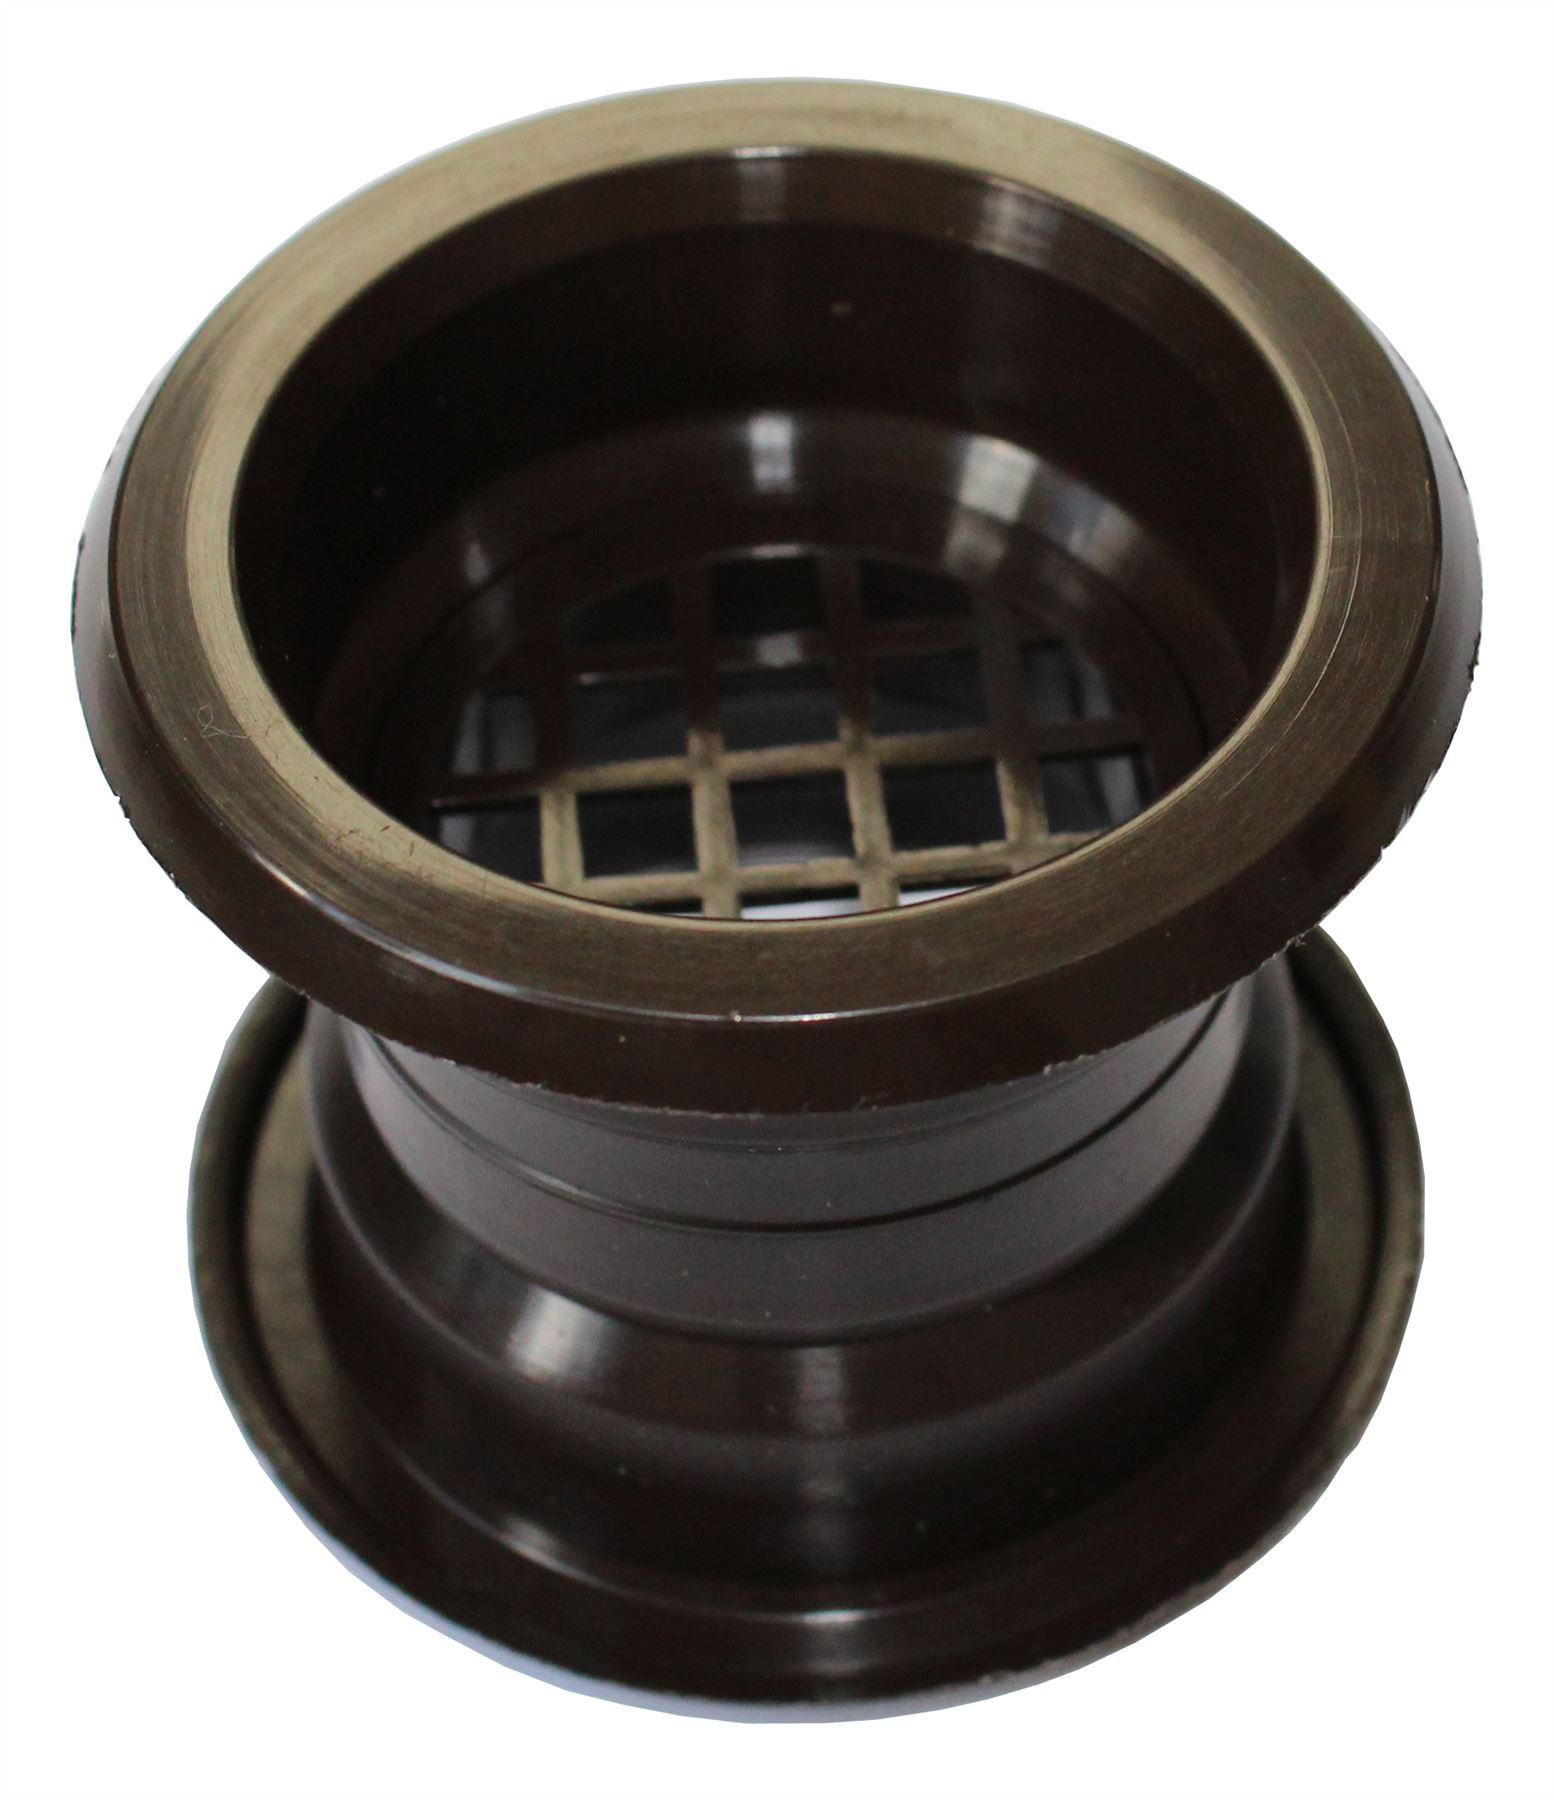 Mini-Circle-Collar-Air-Vent-Grille-Door-Ventilation-  sc 1 st  eBay & Mini Circle Collar Air Vent Grille Door Ventilation Hole Covers 4pcs ...